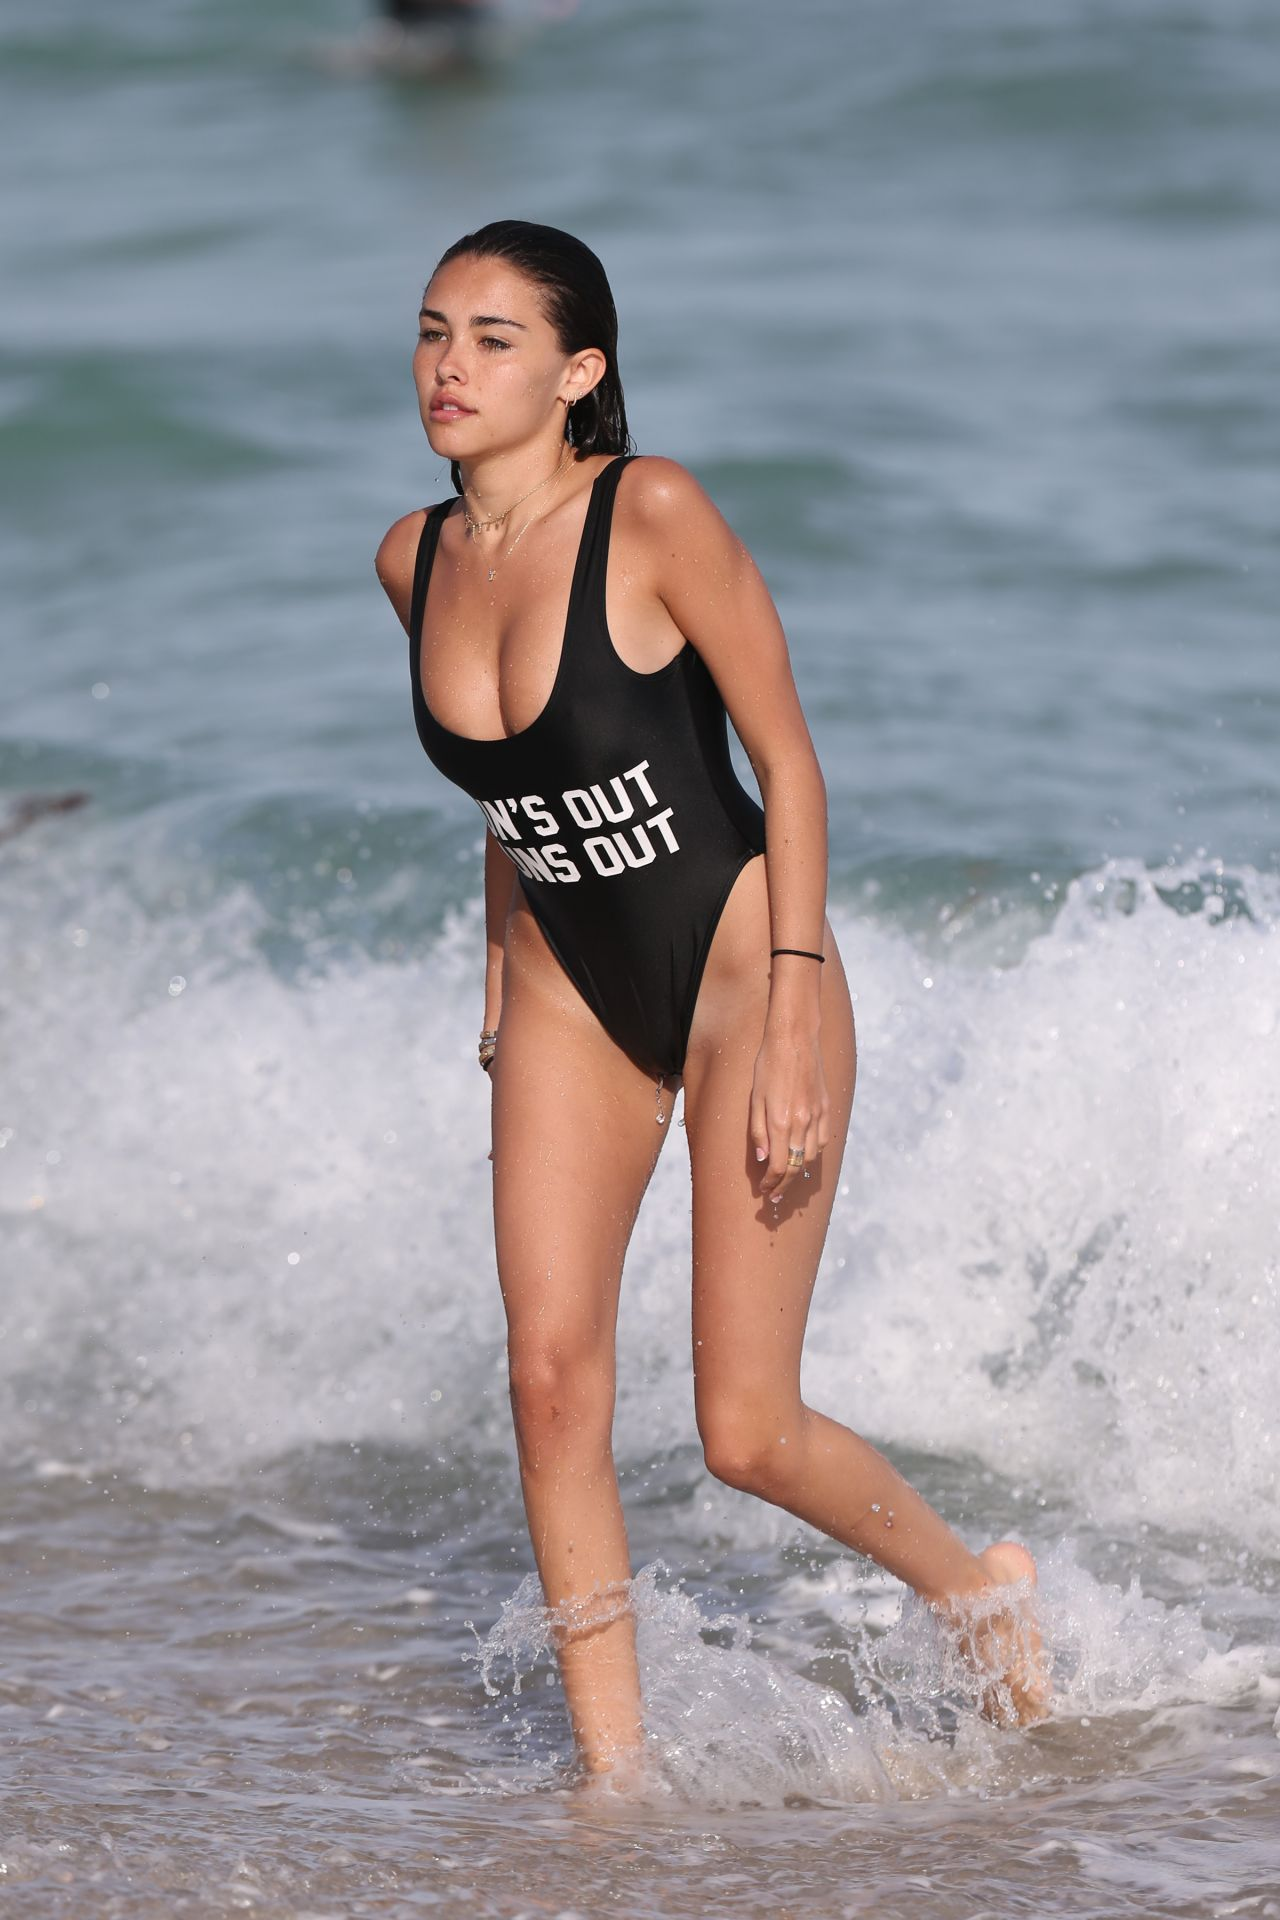 Bikini Bikini Melissa Benoist  nudes (85 pictures), YouTube, legs